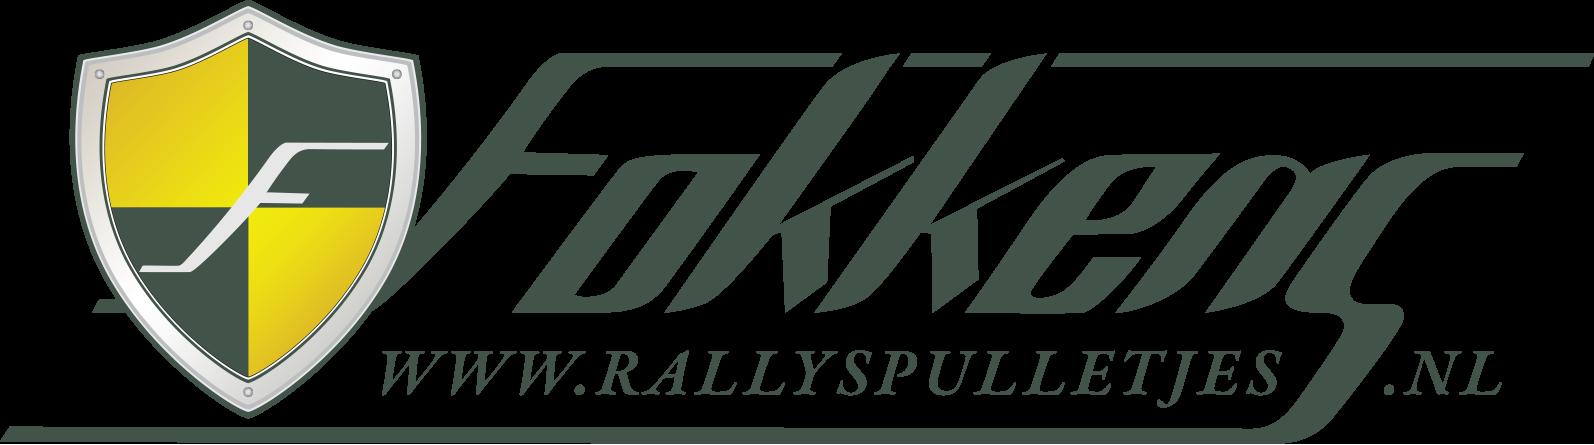 logo fokkensrallyspulletjes